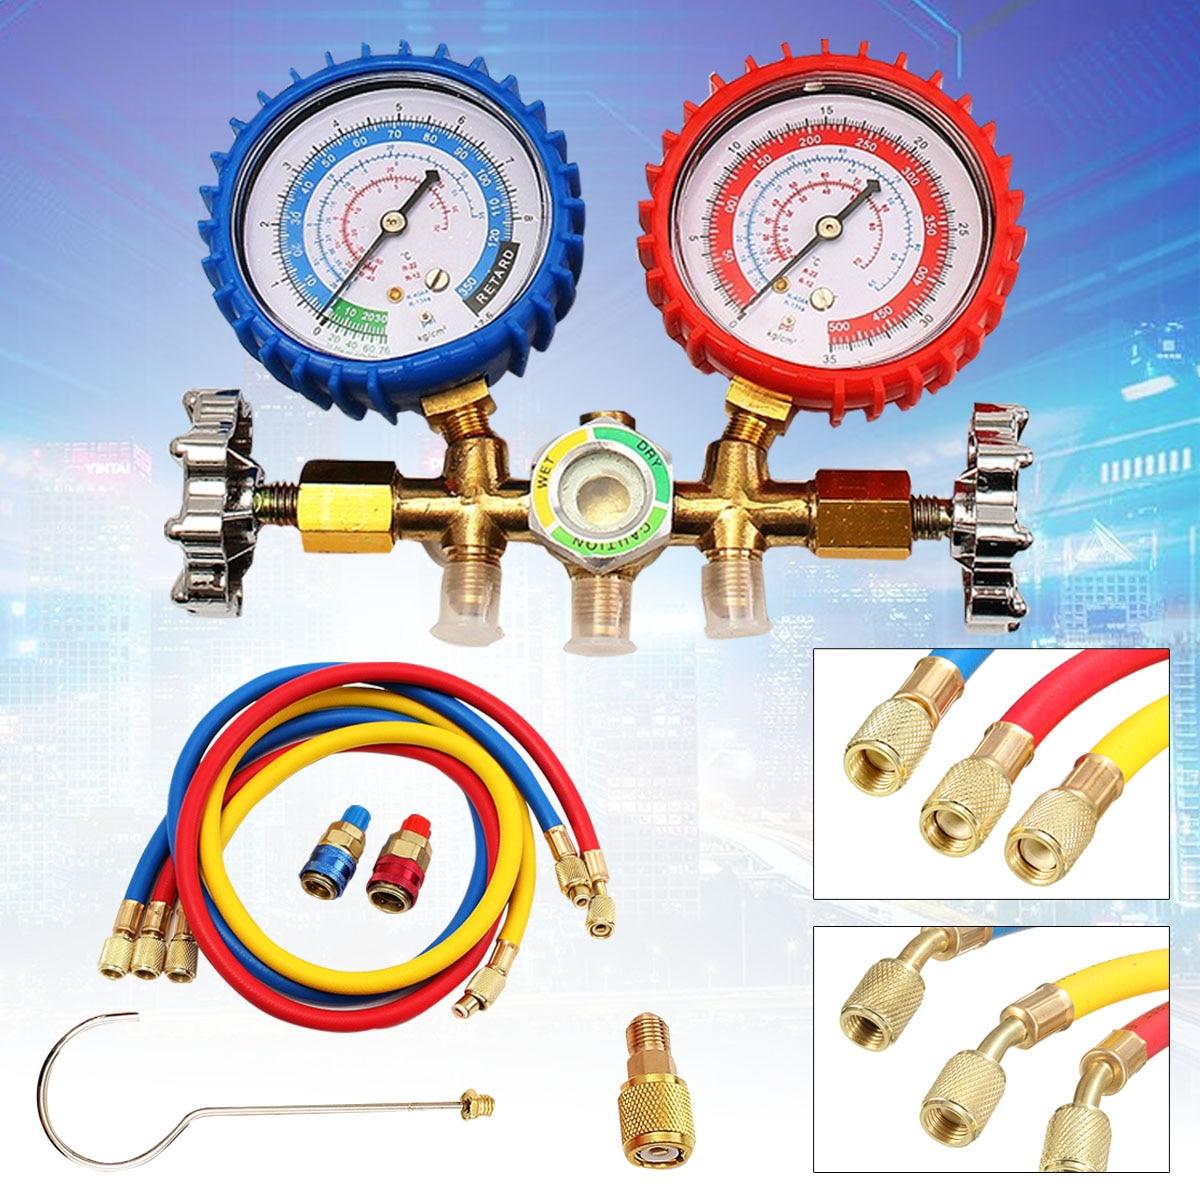 все цены на Diagnostic Tool R12 R22 R134A HVAC A/C Refrigerant Manifold Gauge Charging Hose Couplers Kit Pressure Vacuum Testers Set